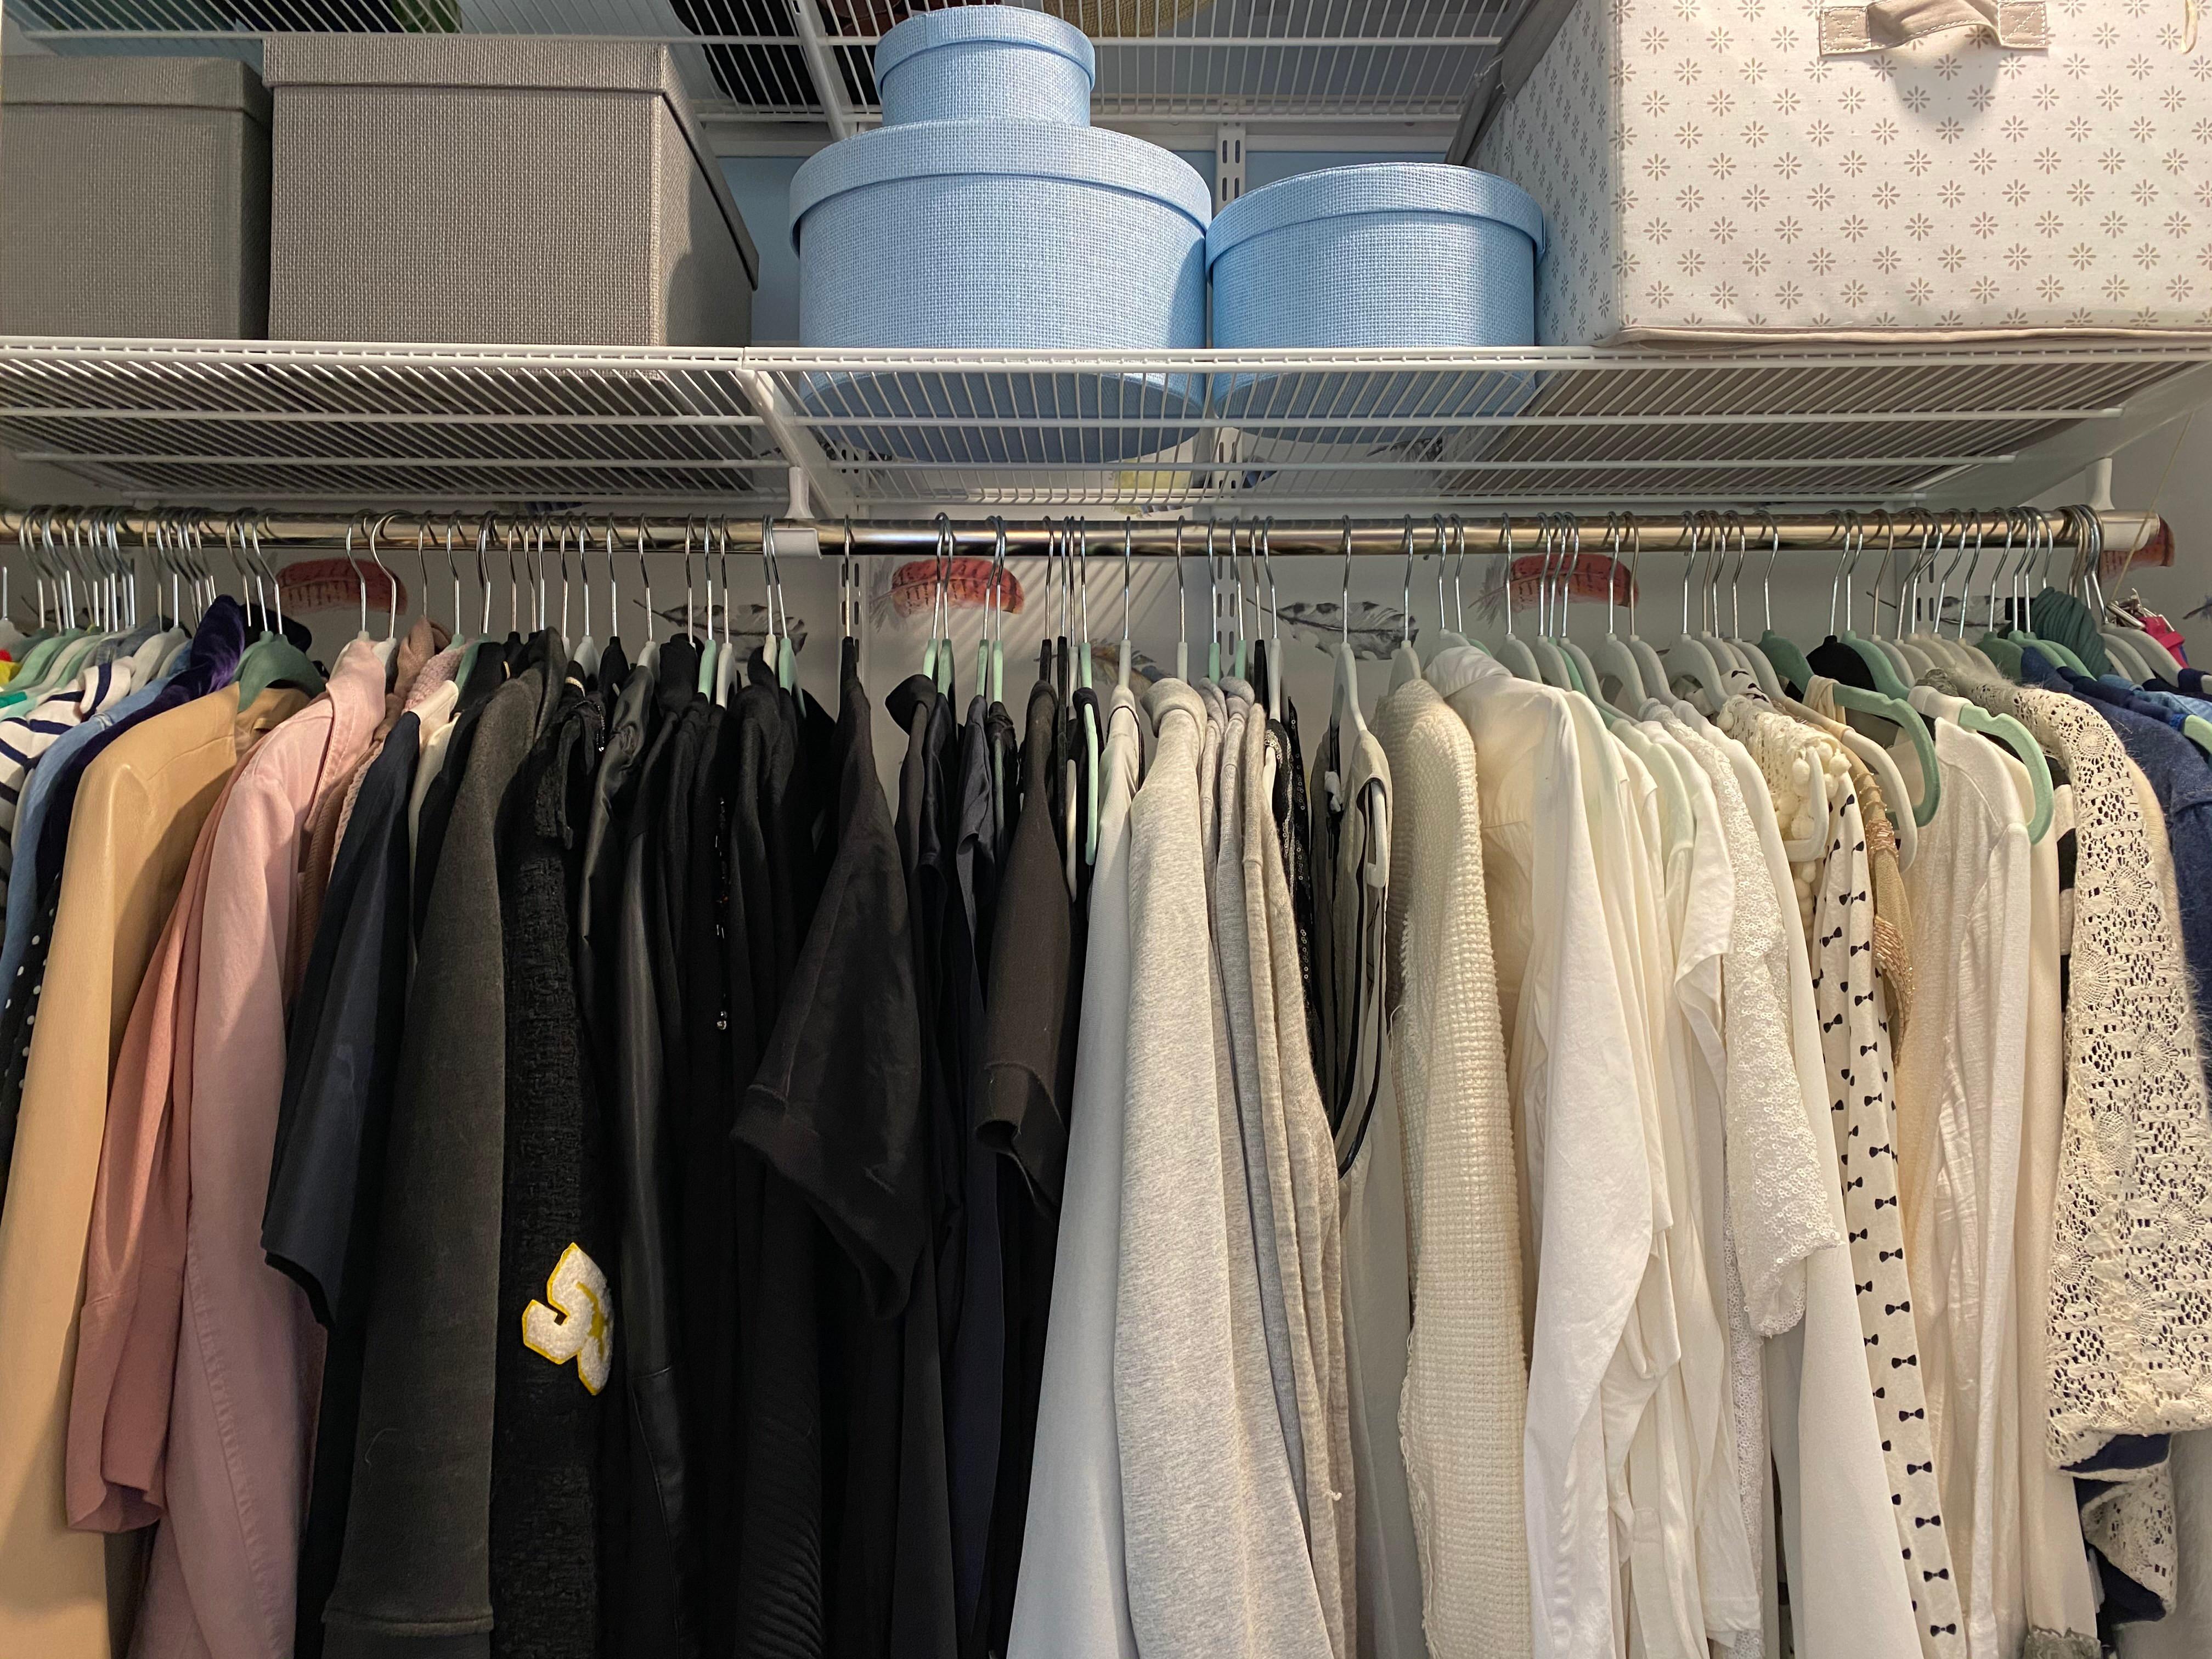 Closet remodel & organizing